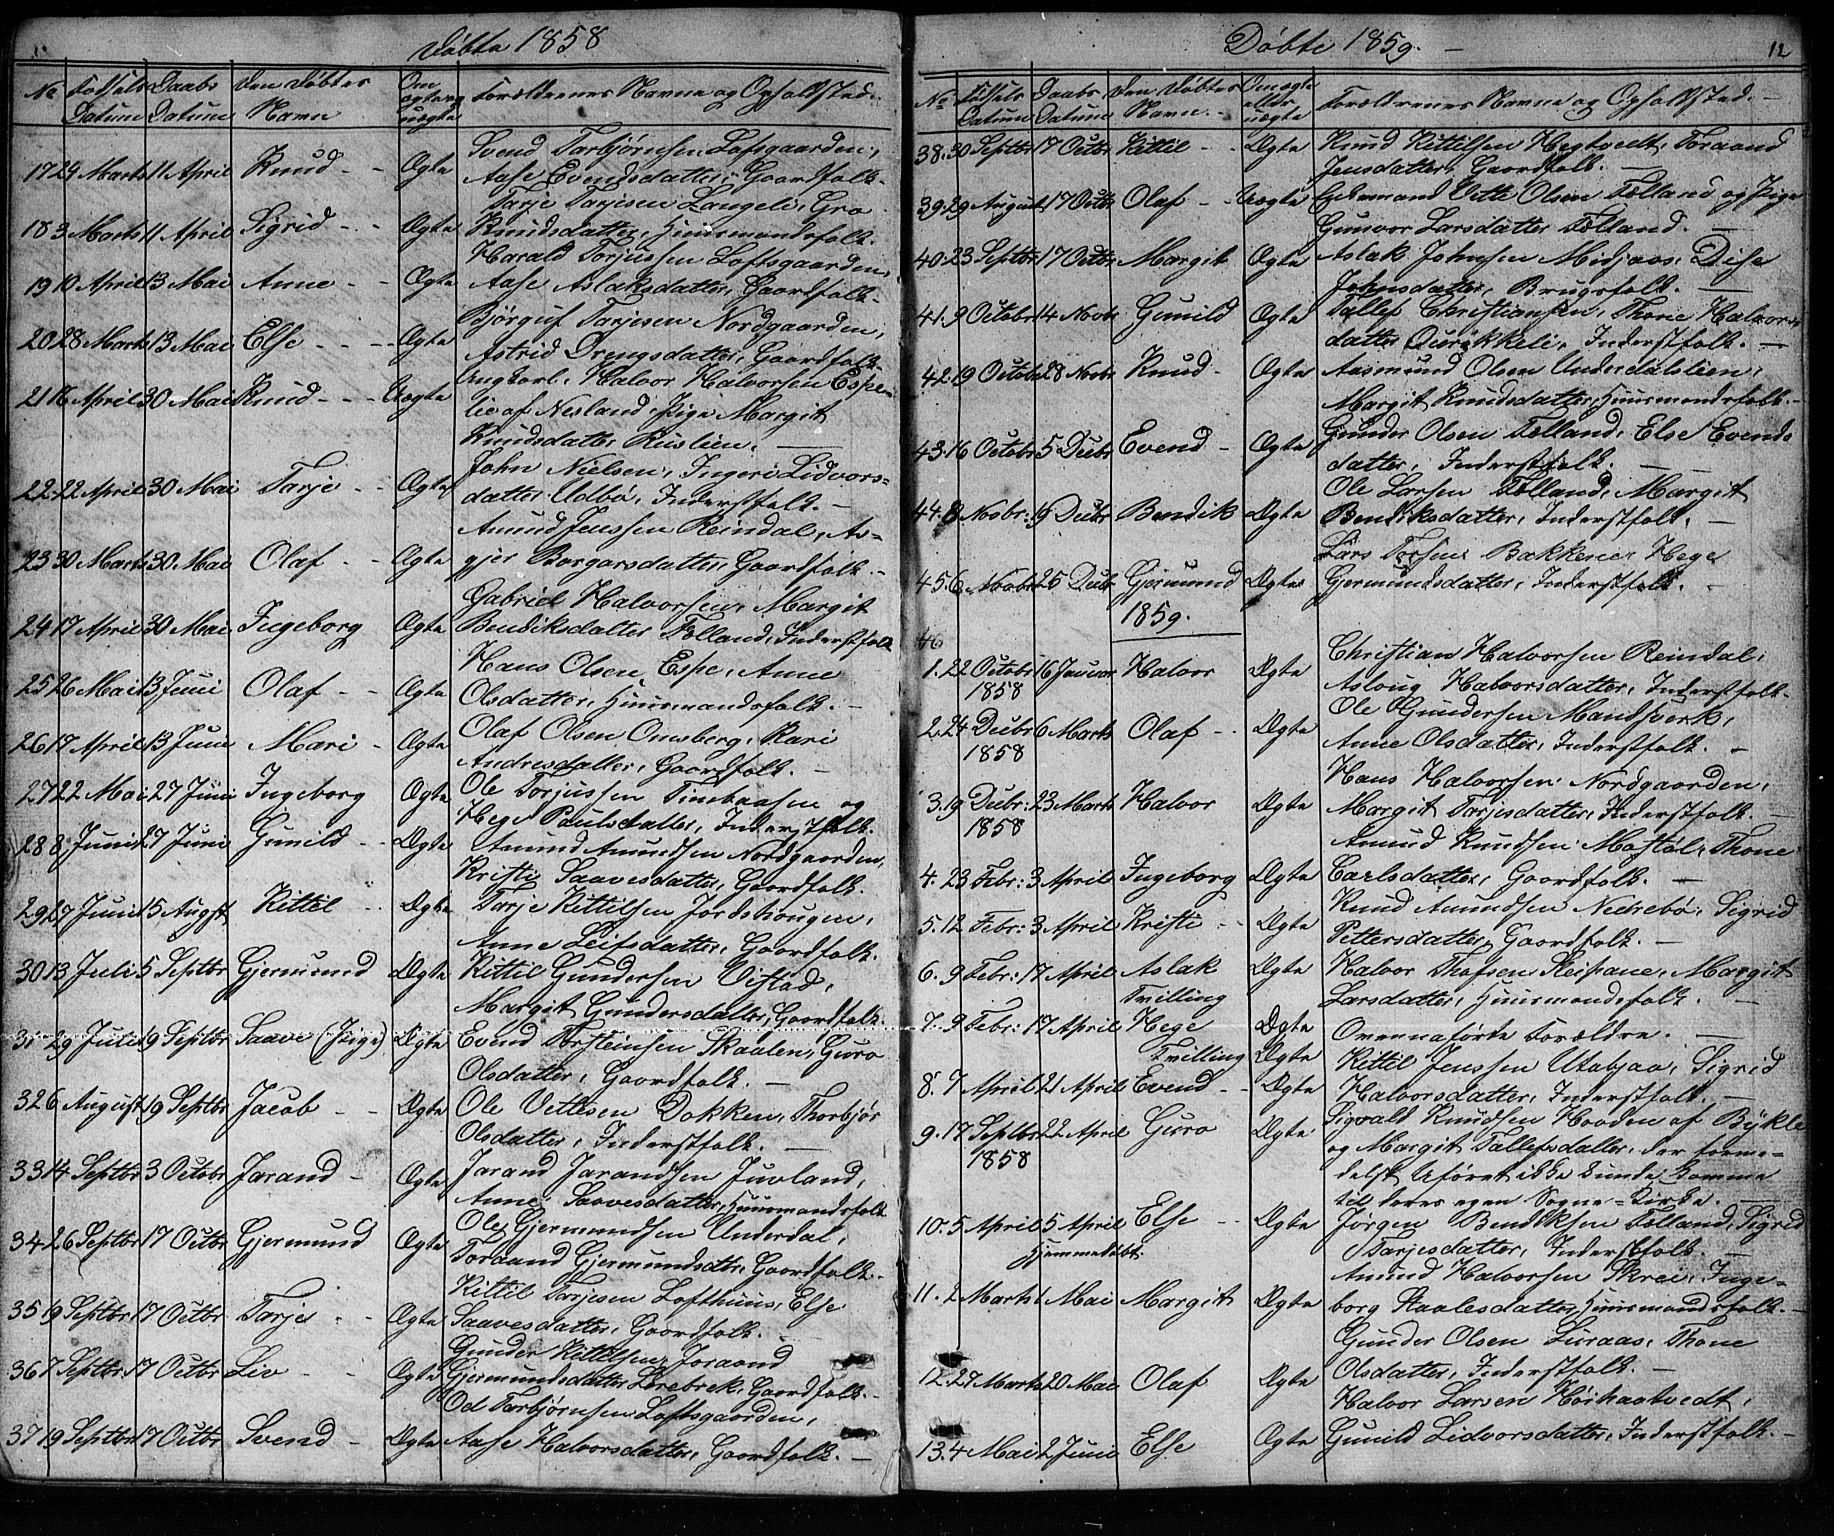 SAKO, Mo kirkebøker, G/Ga/L0001: Klokkerbok nr. I 1, 1851-1891, s. 12